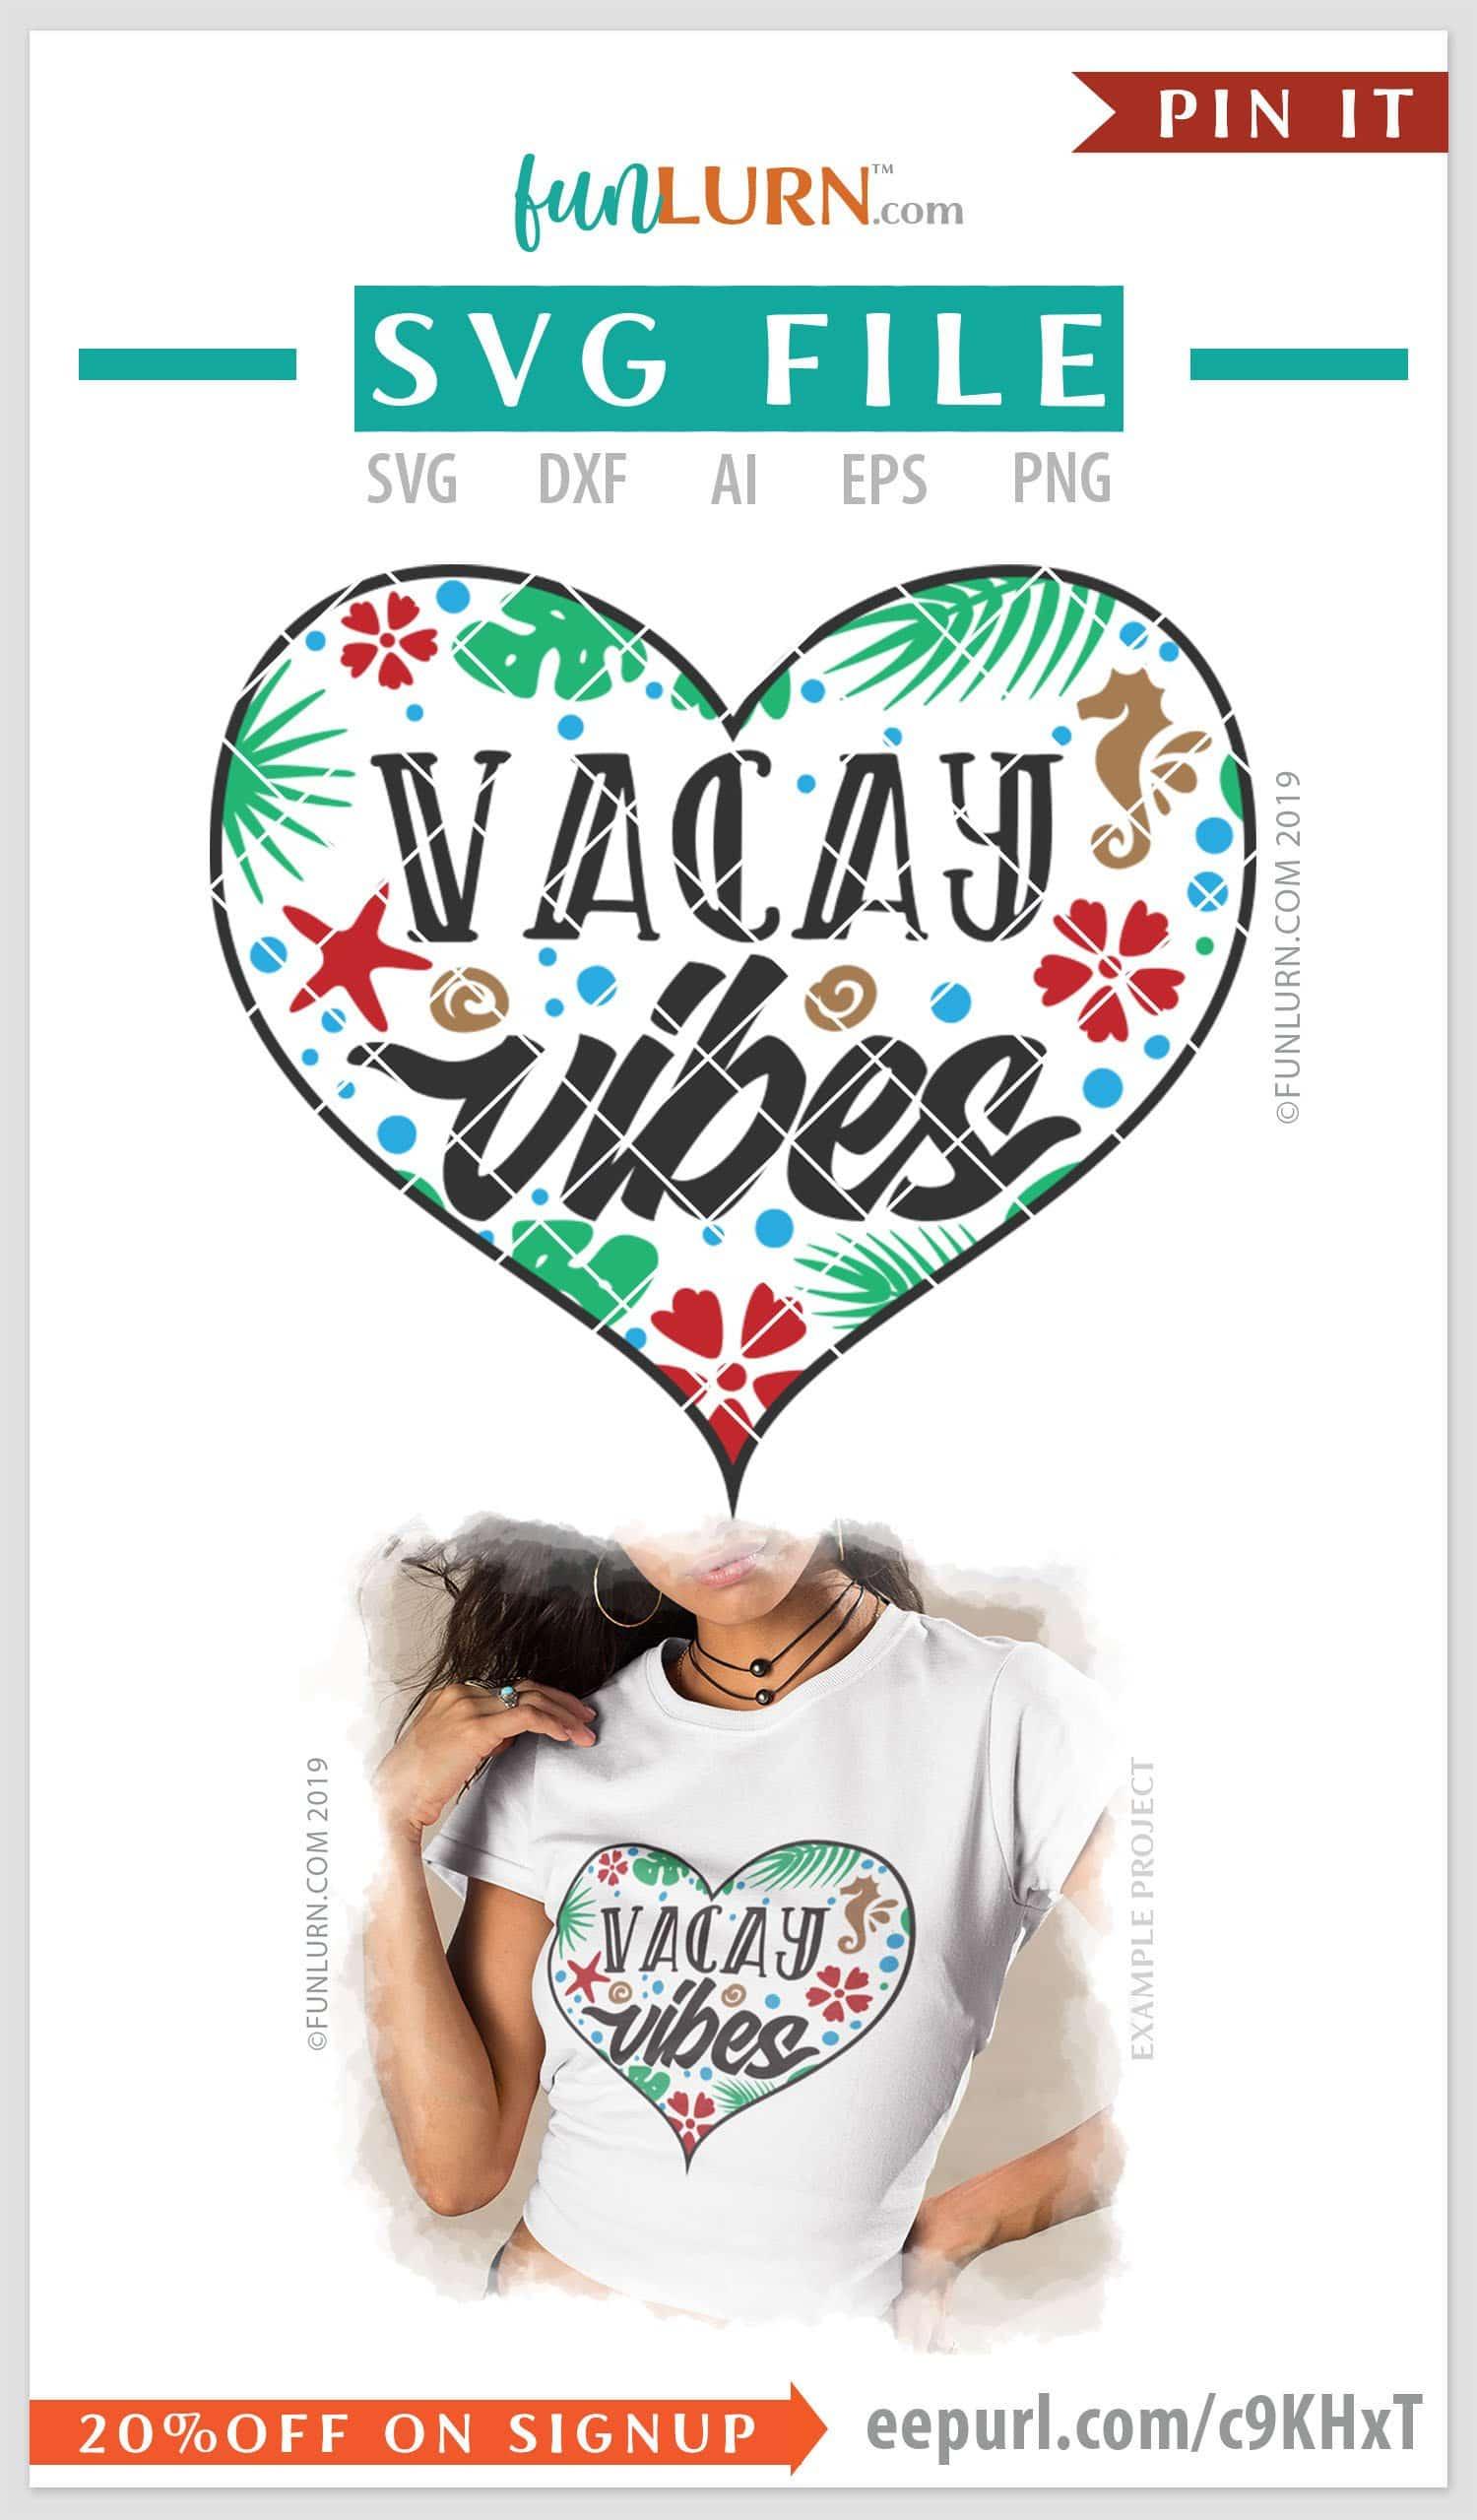 Vacay vibes - FunLurn